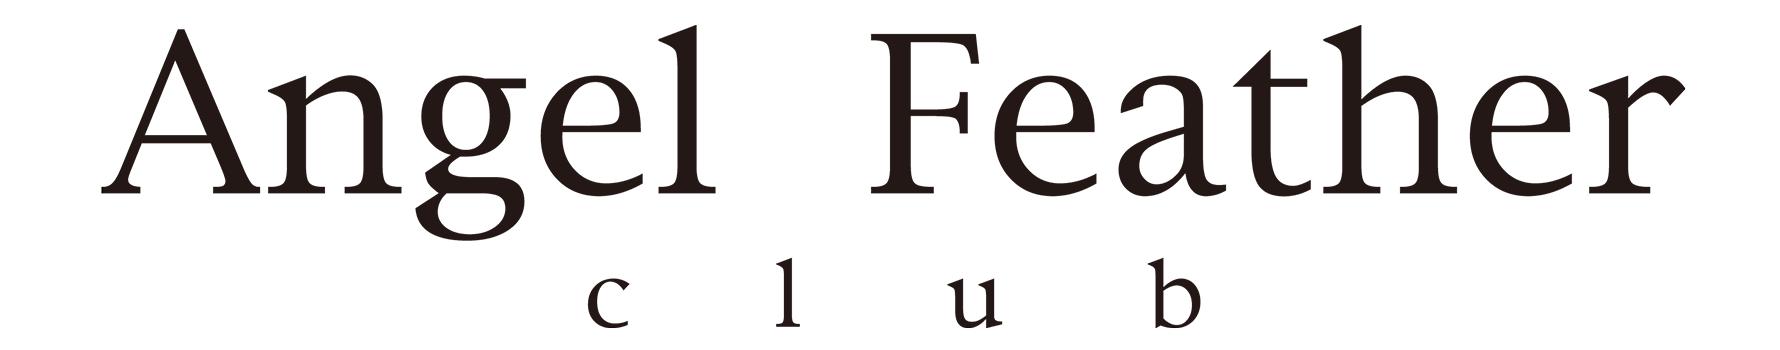 Angel Feather 池袋【エンジェルフェザー イケブクロ】(池袋)のロゴ